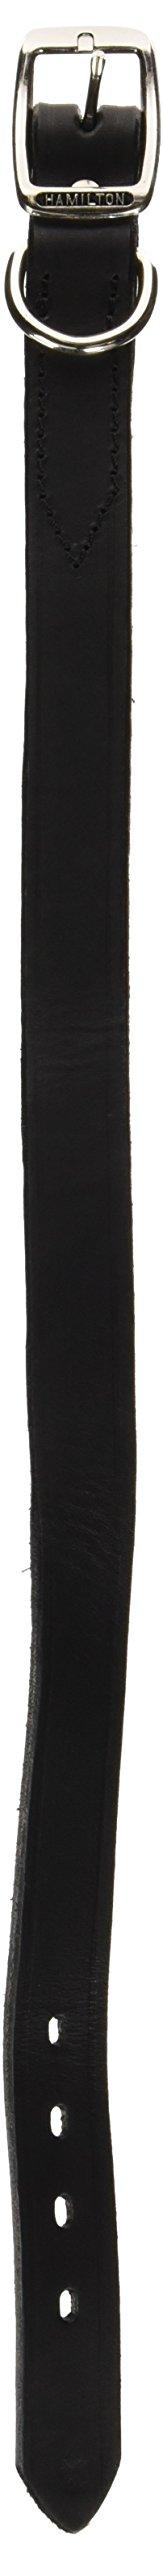 Hamilton 1'' x 24'' Creased Black Leather Dog Collar